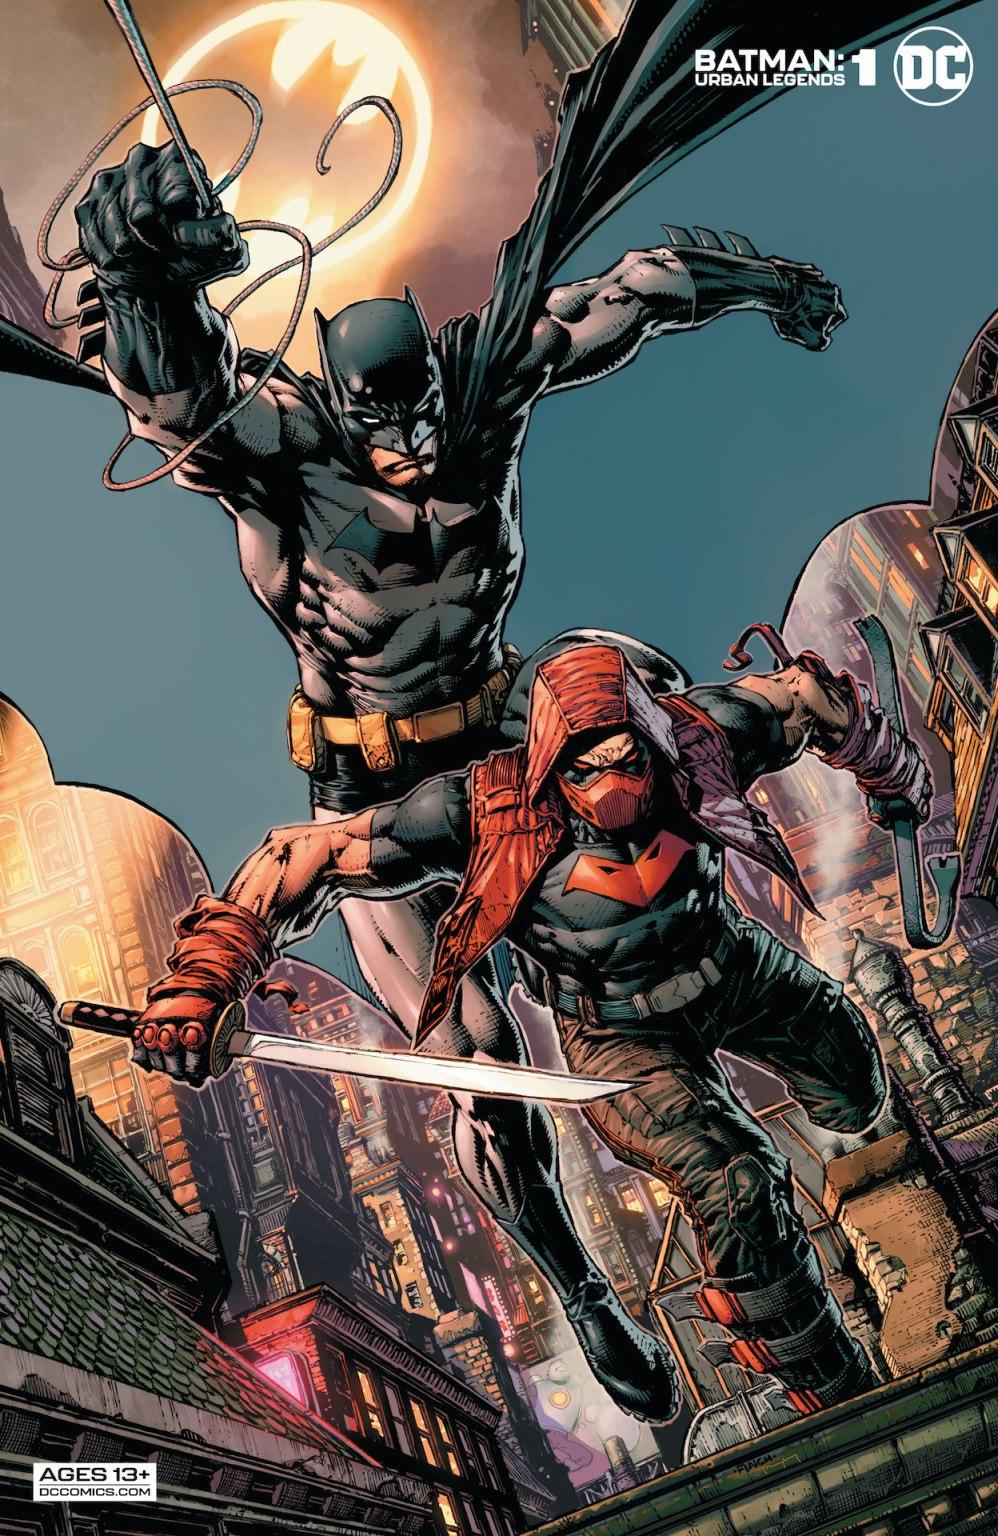 Batman: Urban Legends #1 preview